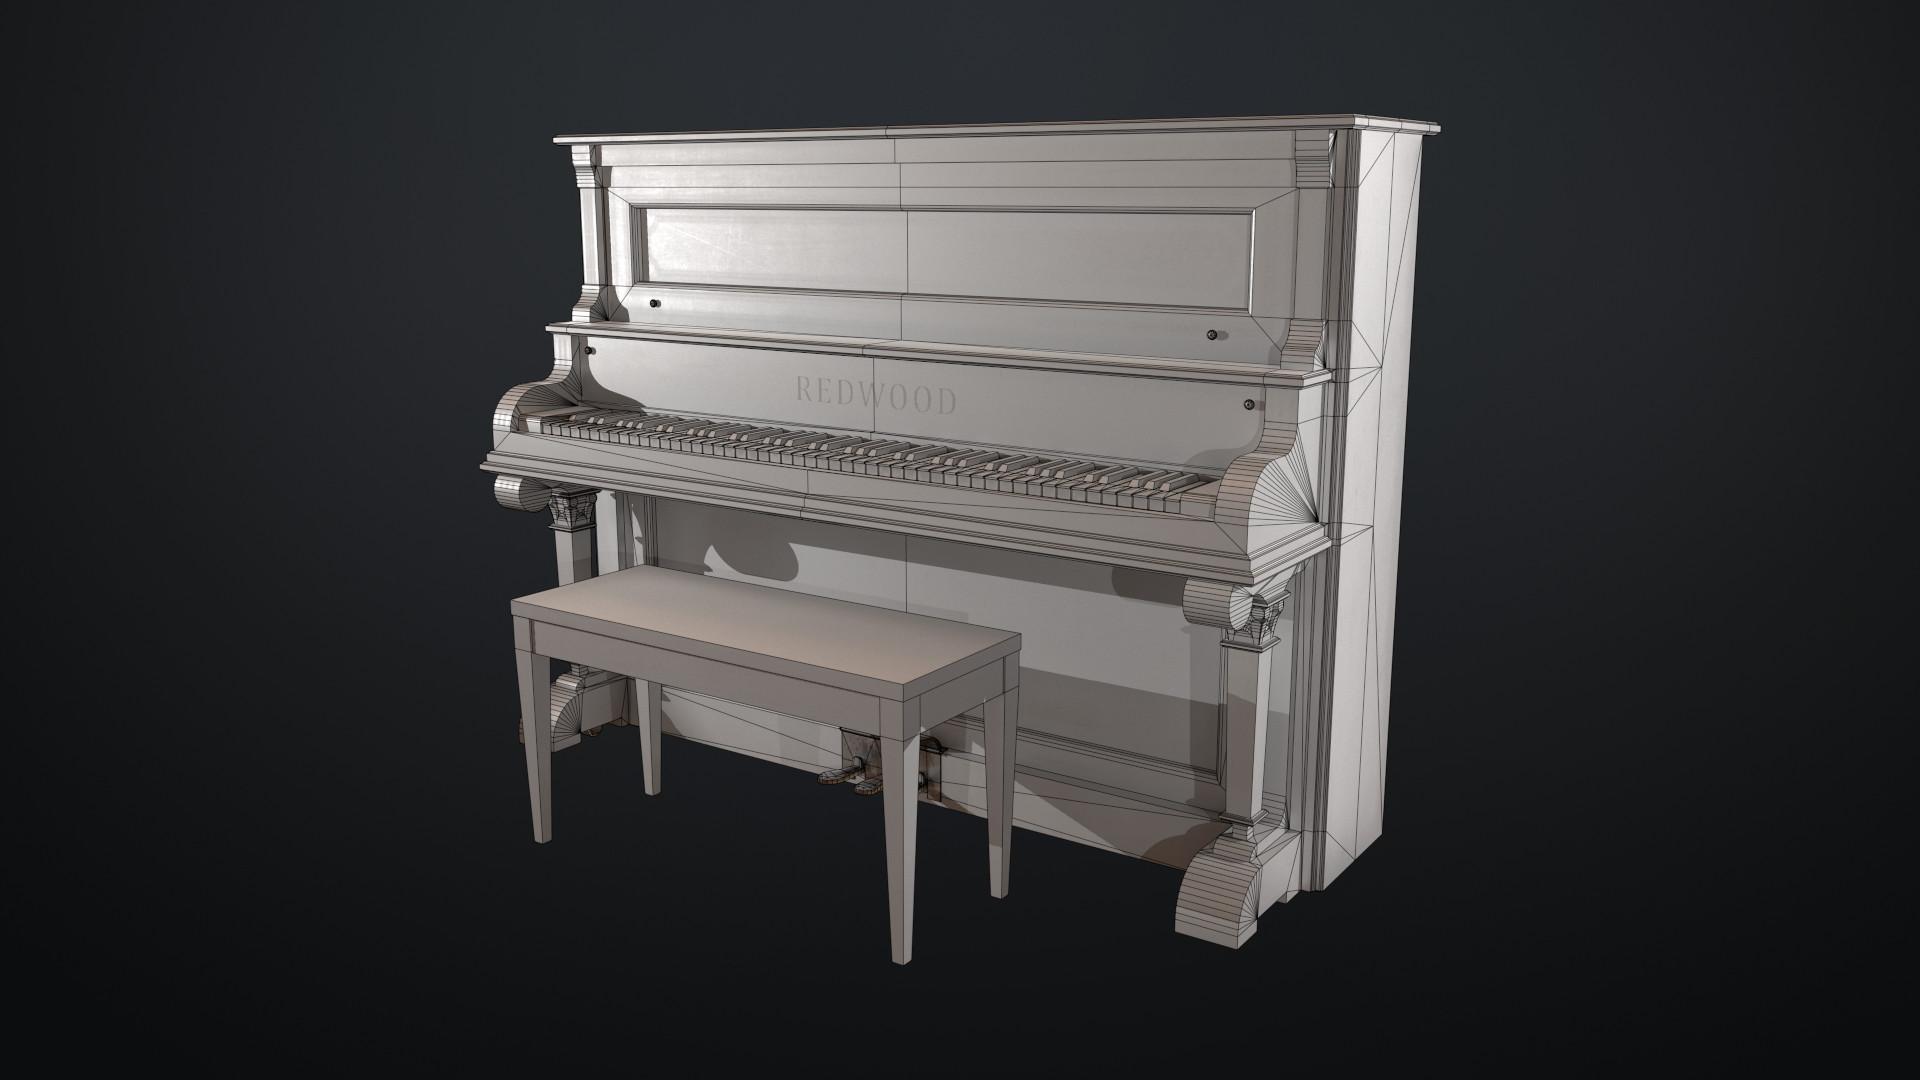 Sami tarvainen piano render 6